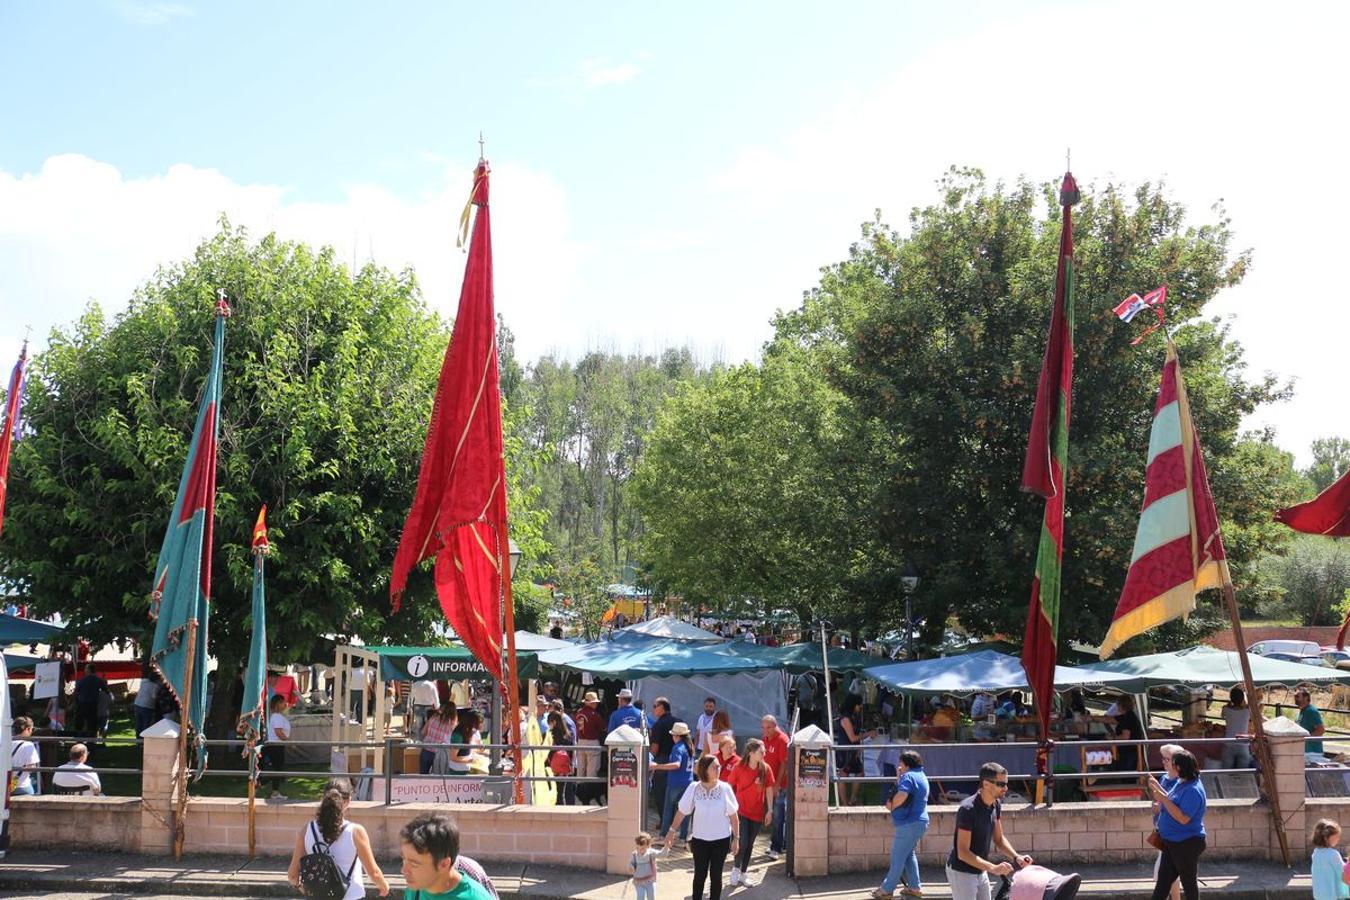 VIII Feria de Artesanía de Lorenzana